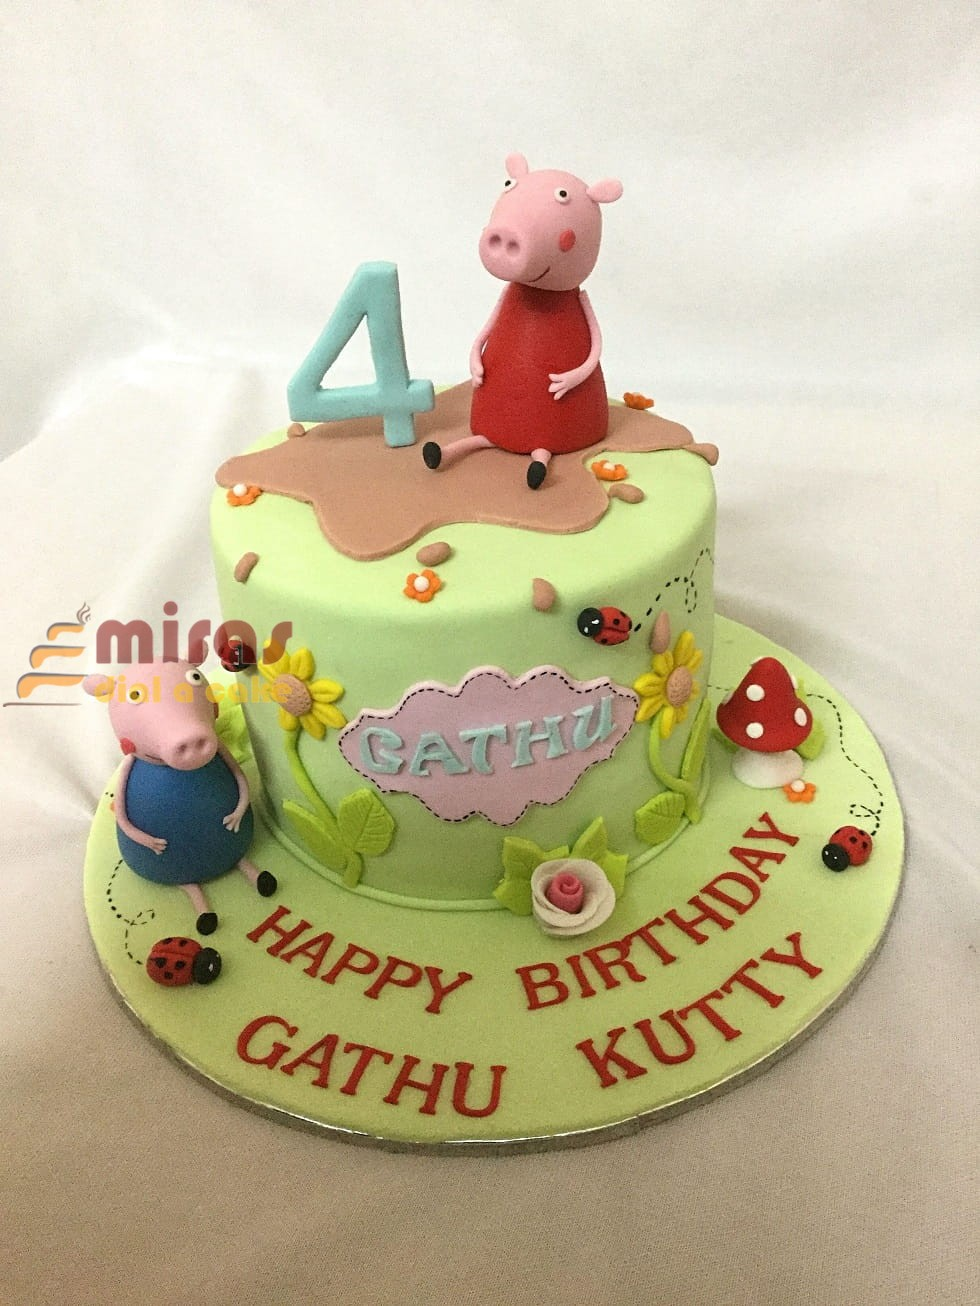 Astonishing Peppa Pig Theme Birthday Cake Online Customized Birthday Cakes Funny Birthday Cards Online Elaedamsfinfo